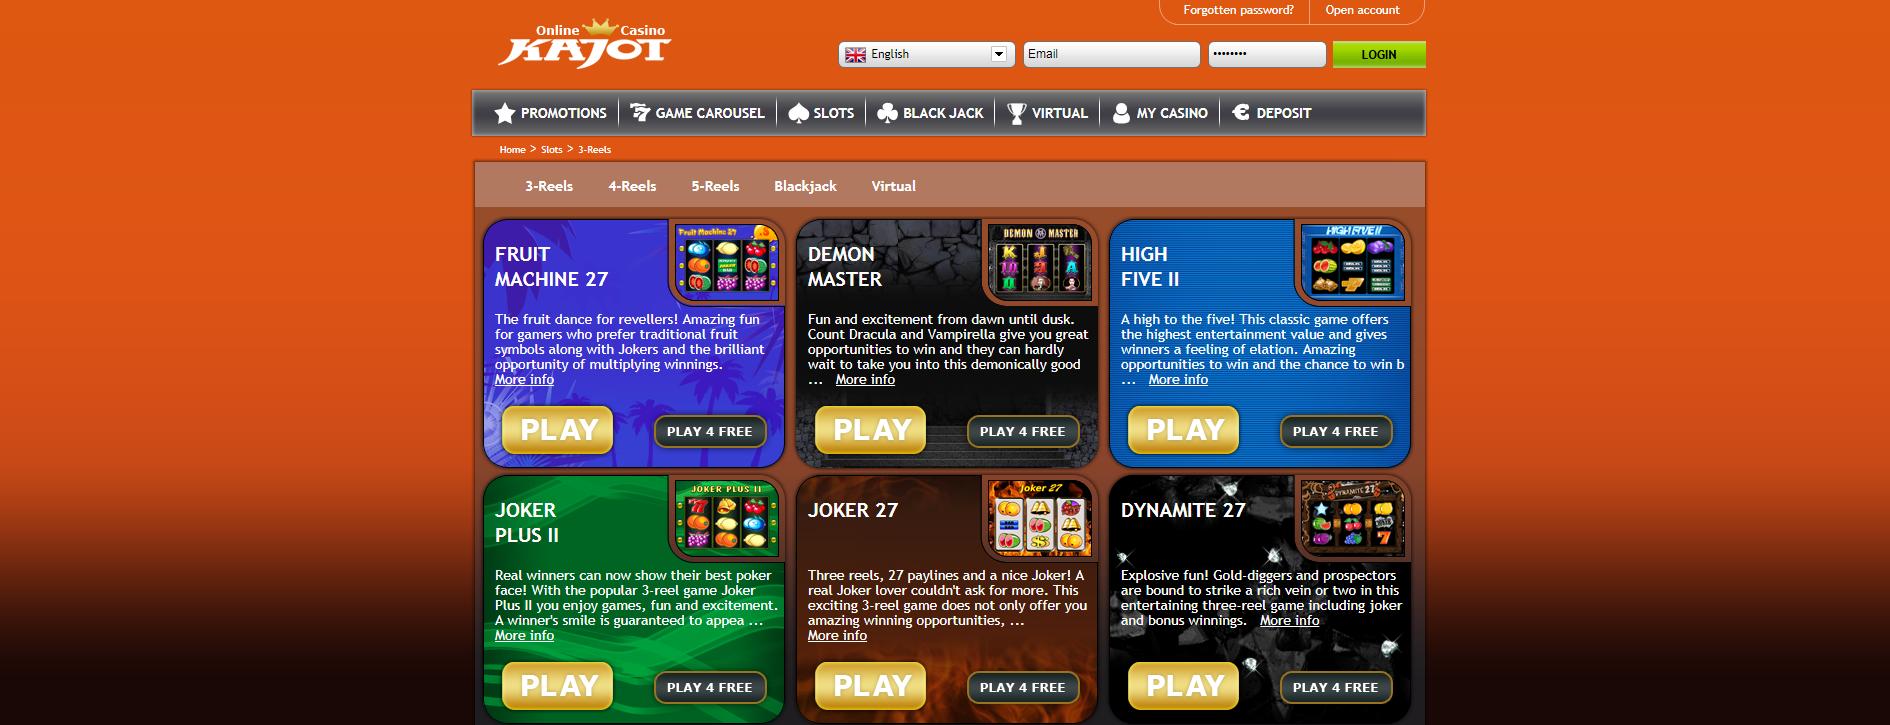 Kajot-Casino-Online-Games